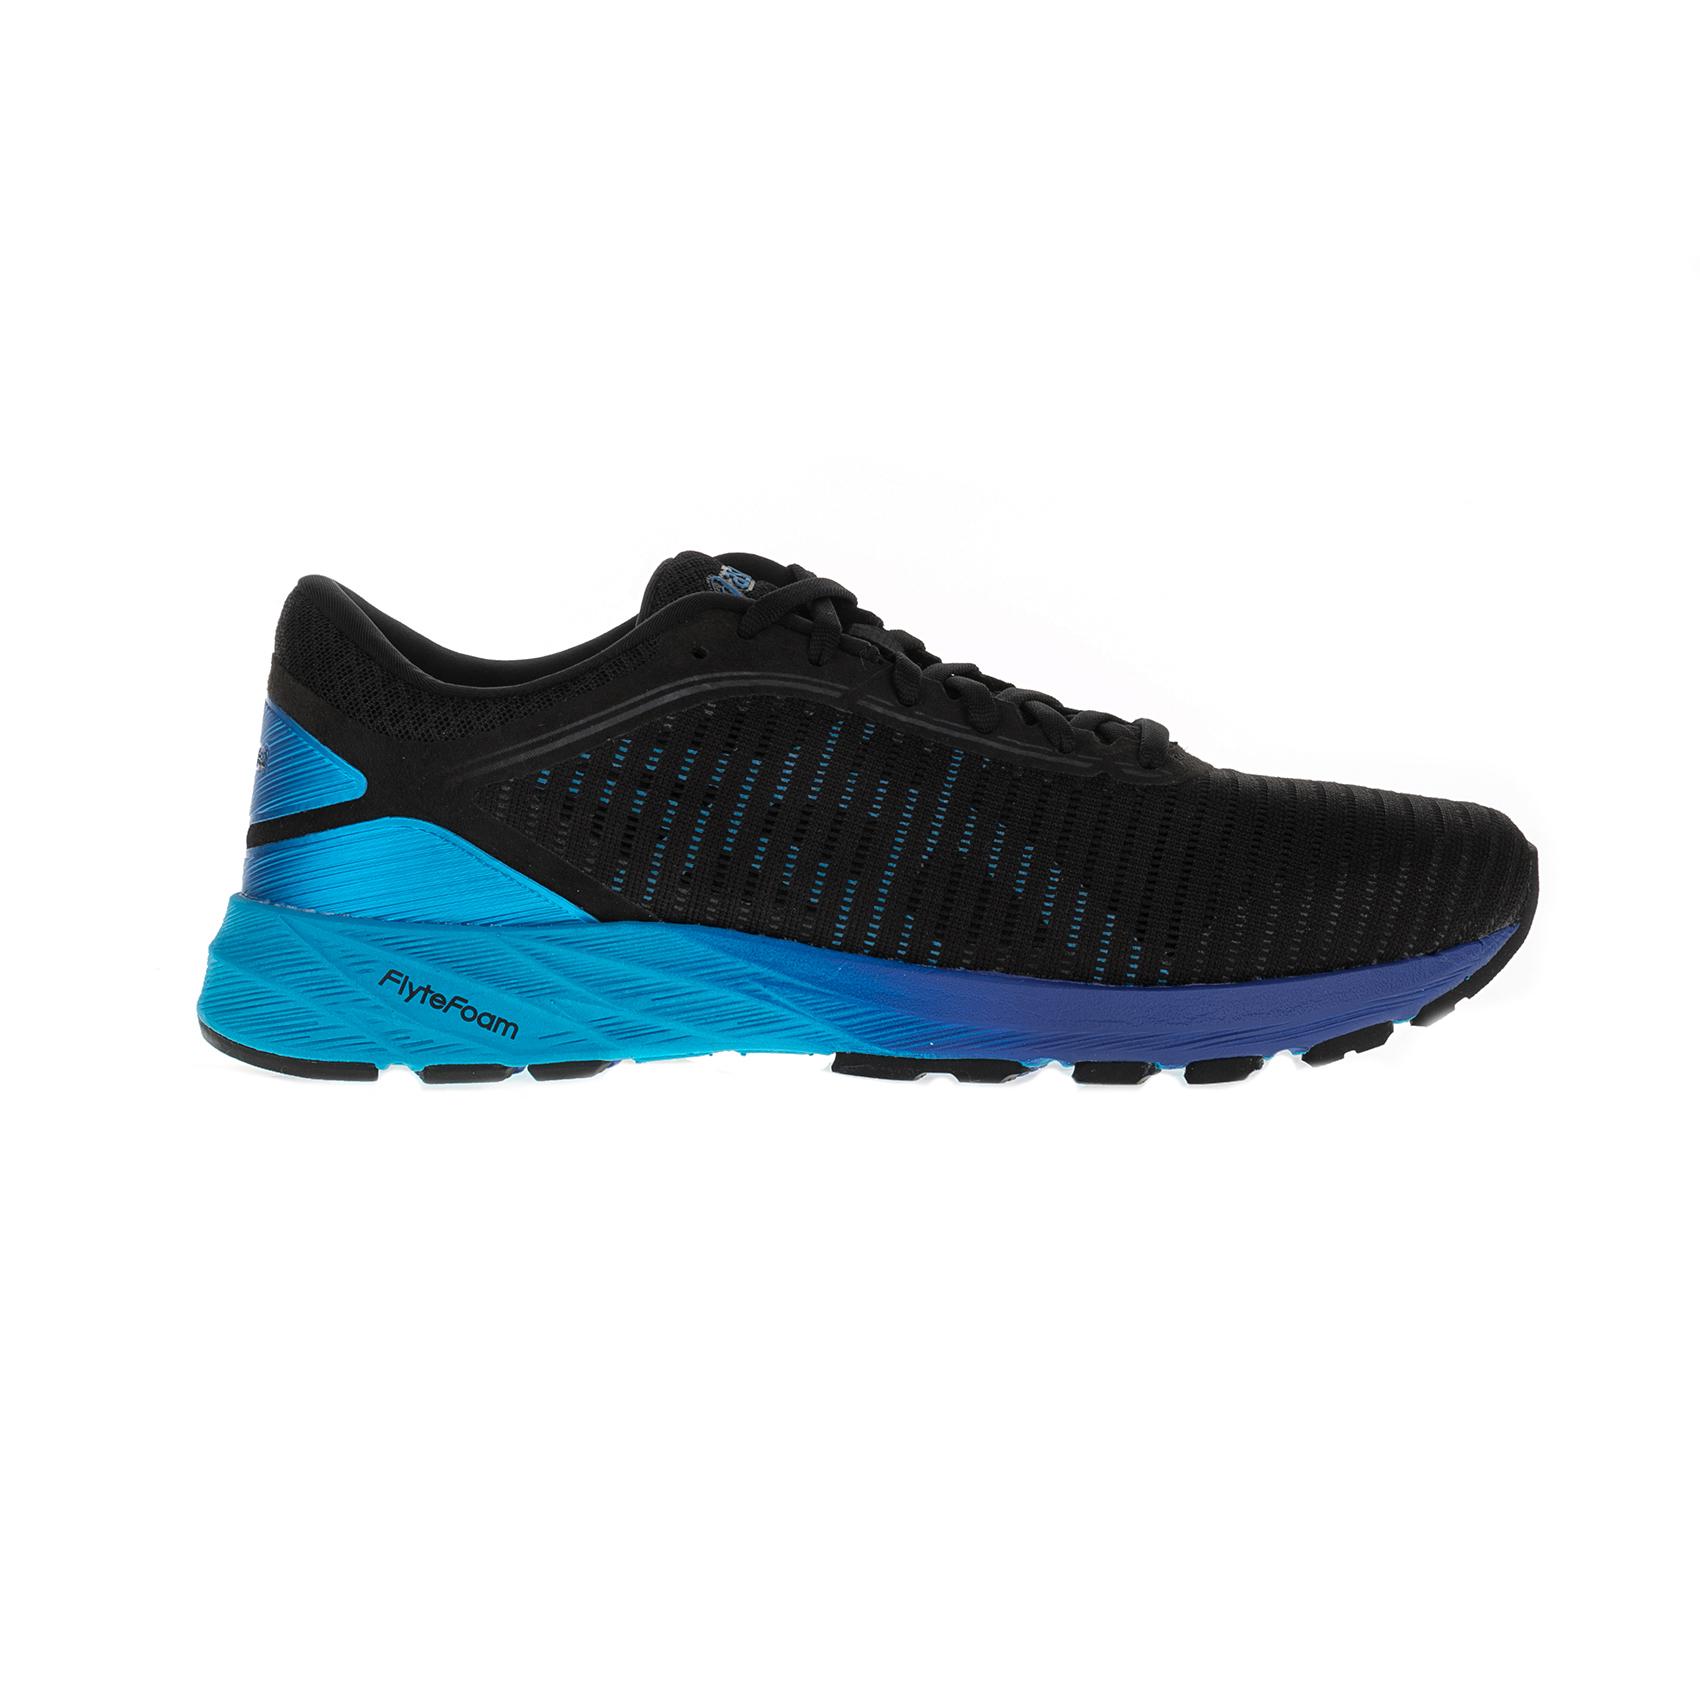 ASICS - Ανδρικά παπούτσια ASICS DynaFlyte 2 μάυρα-μπλε ανδρικά παπούτσια αθλητικά running